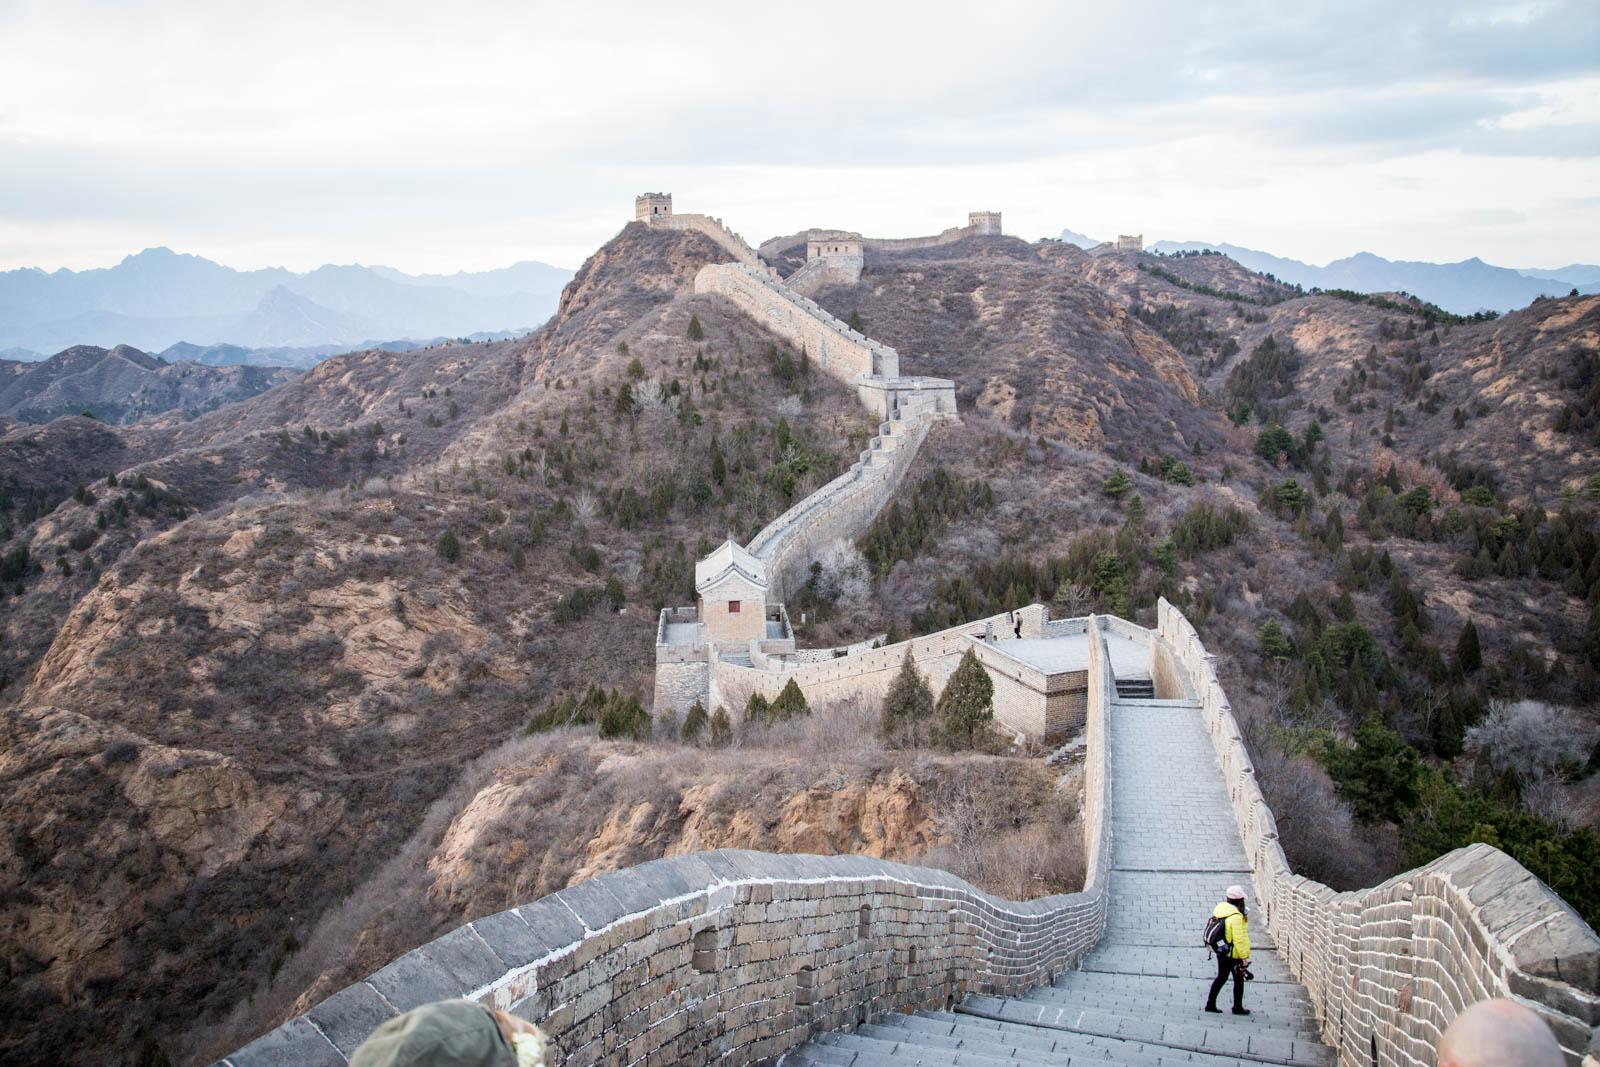 Kiinan Muuri Salo